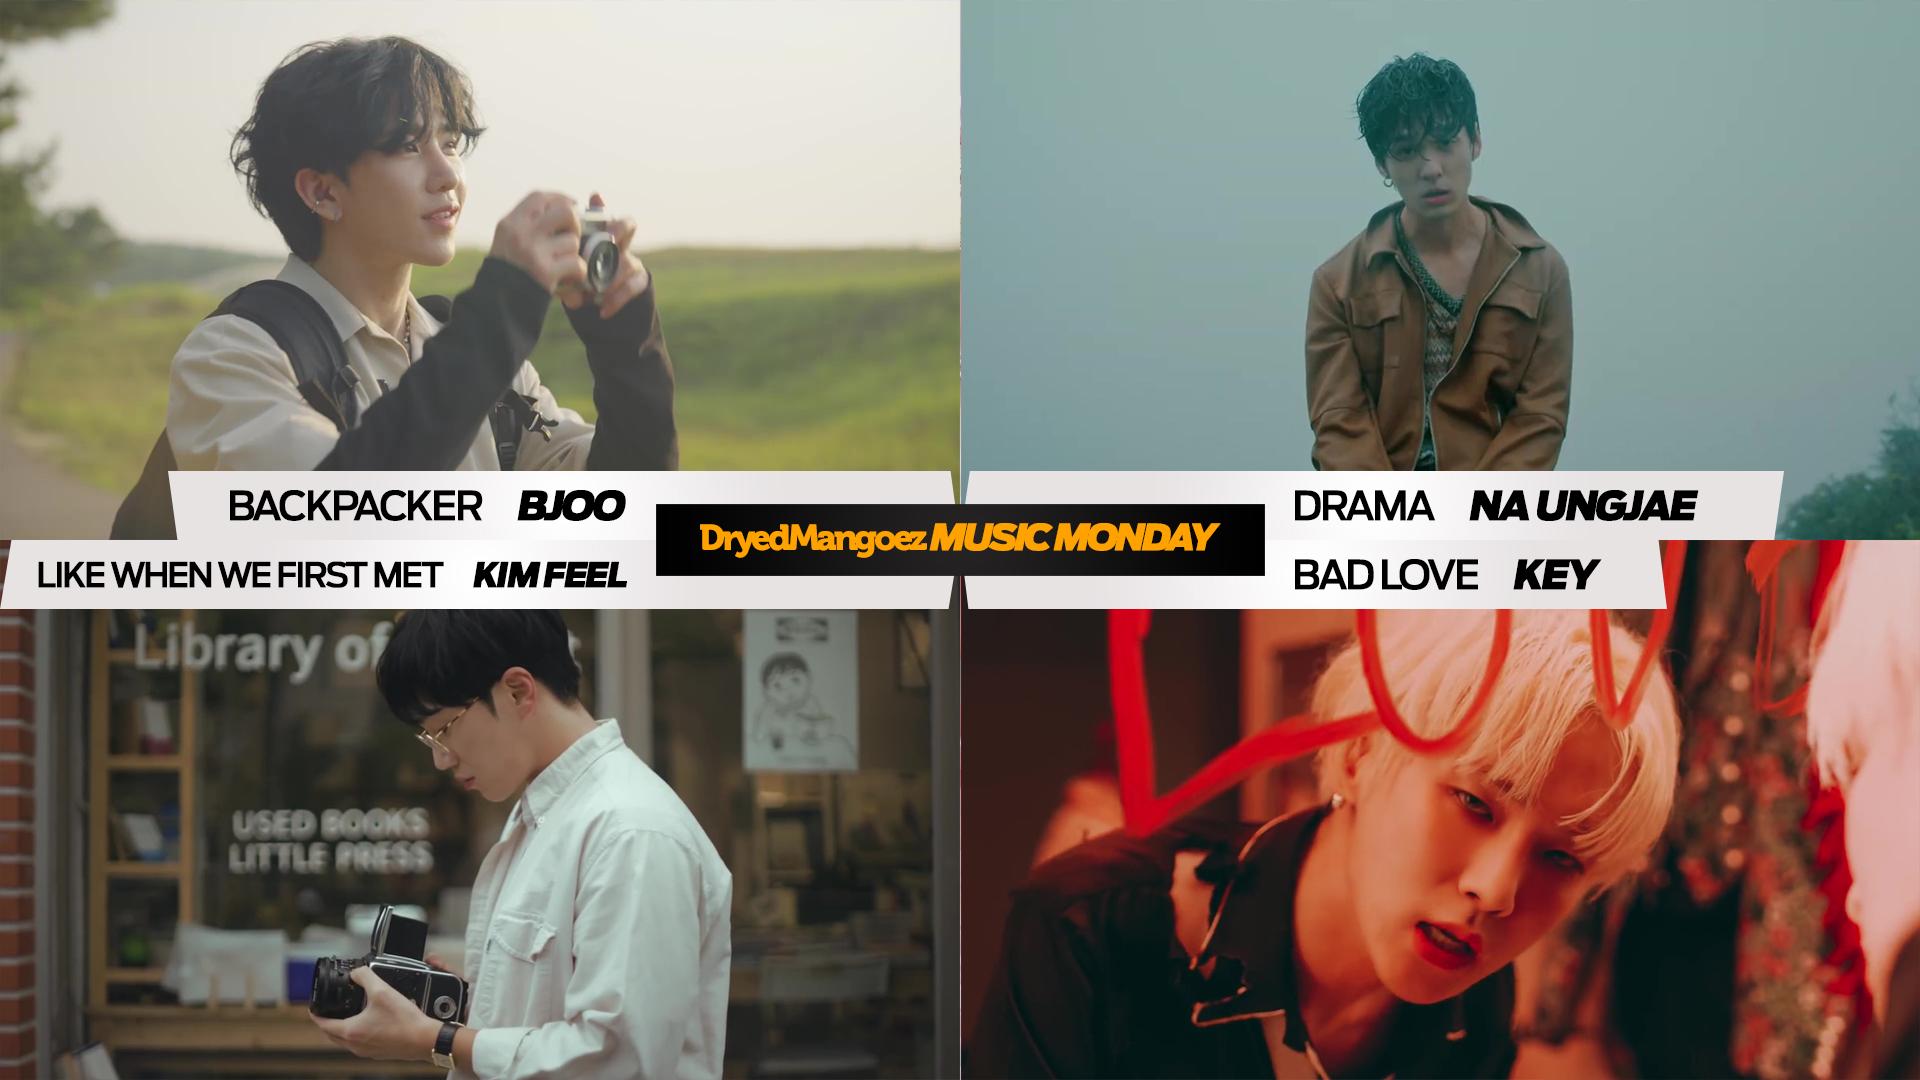 Music Monday, October 4, 2021 – BJOO, Na Ungjae, Kim Feel, Key